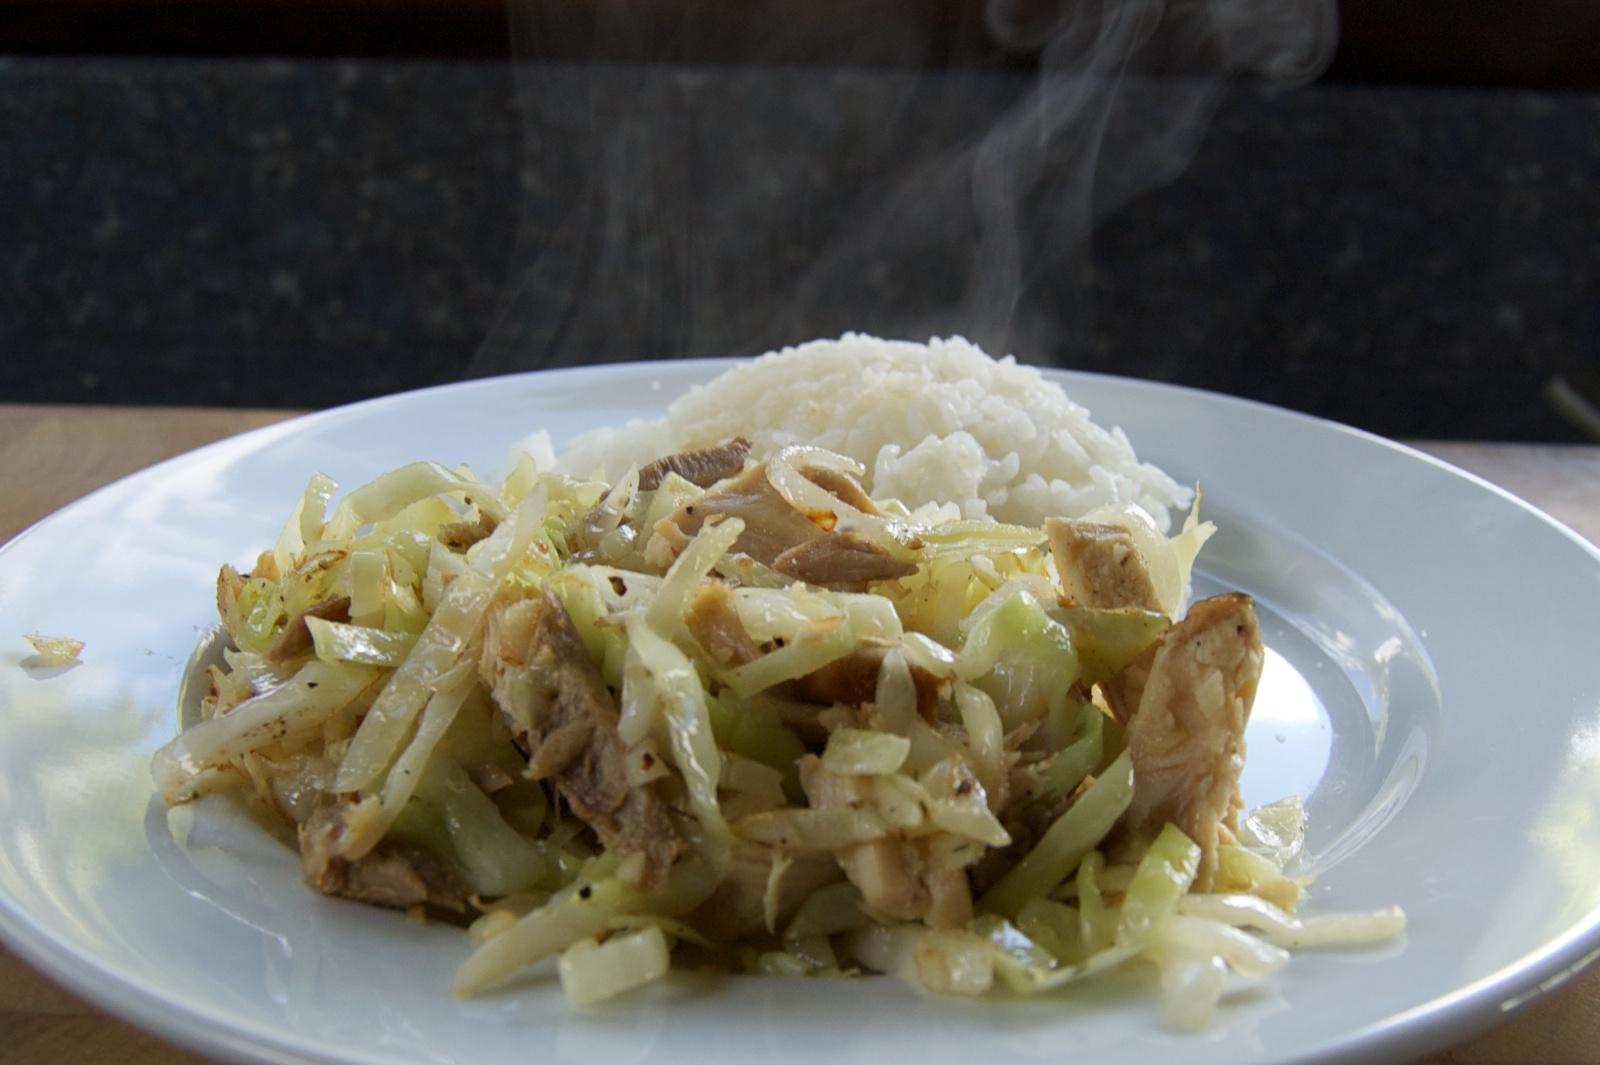 http://blog.rickk.com/food/2012/09/23/ate.2012.09.23.l.jpg